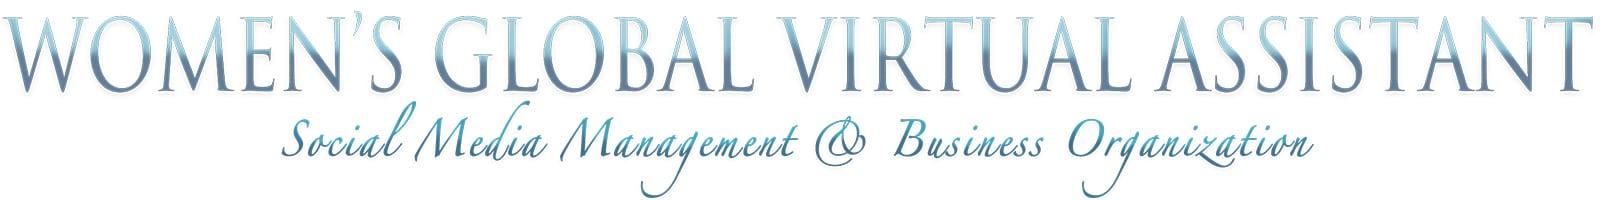 Social Media Management & Business Organization